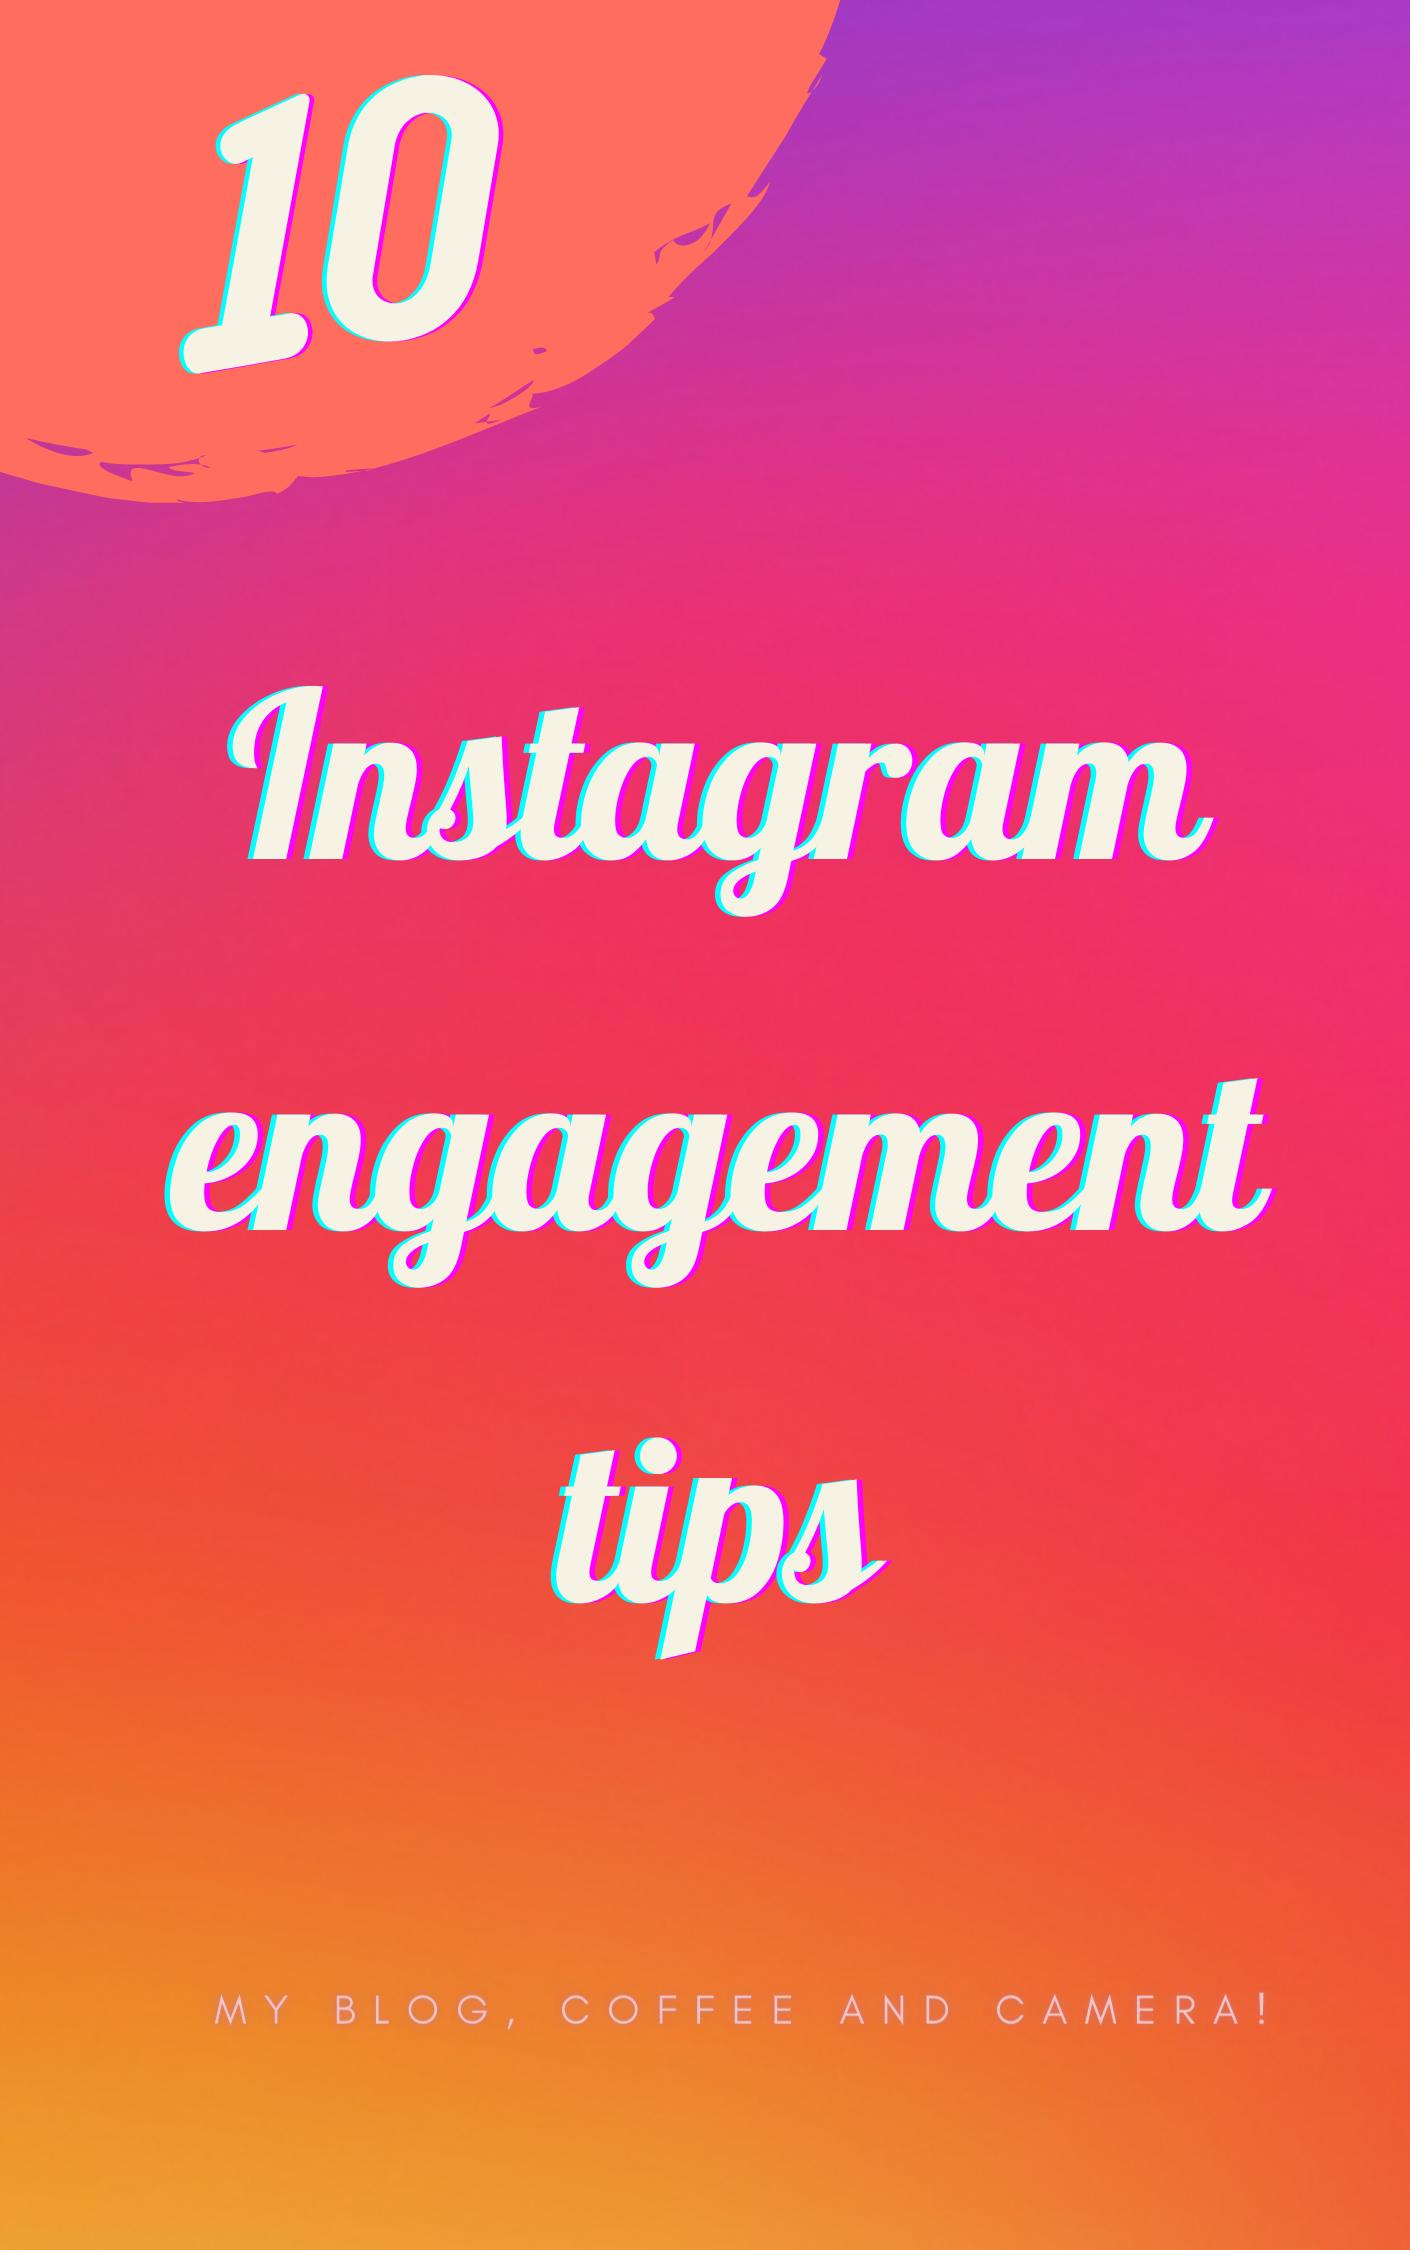 10 Instagram Engagement Tips